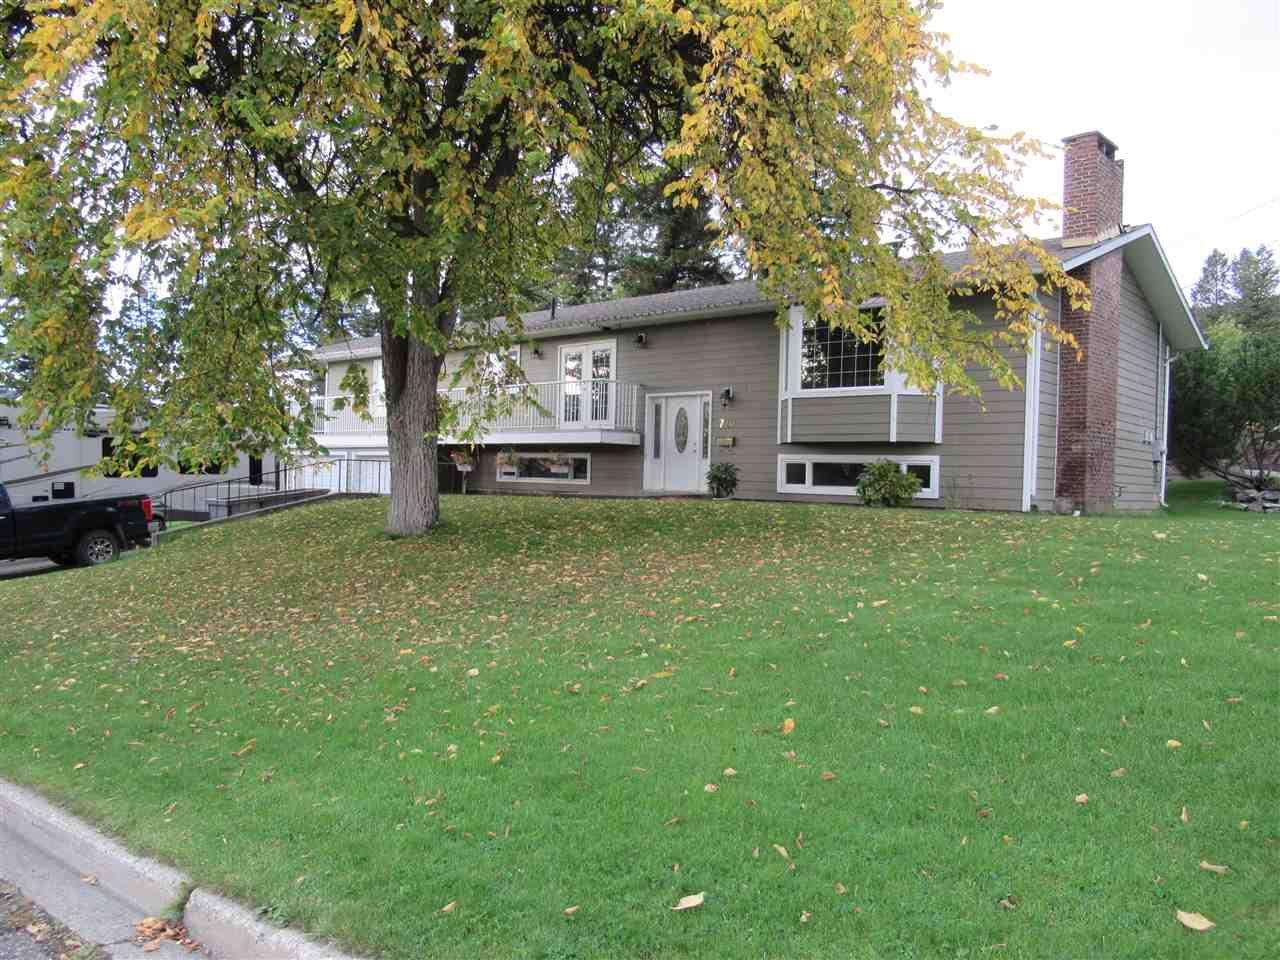 Main Photo: 720 HADDOCK Avenue in Williams Lake: Williams Lake - City House for sale (Williams Lake (Zone 27))  : MLS®# R2508832